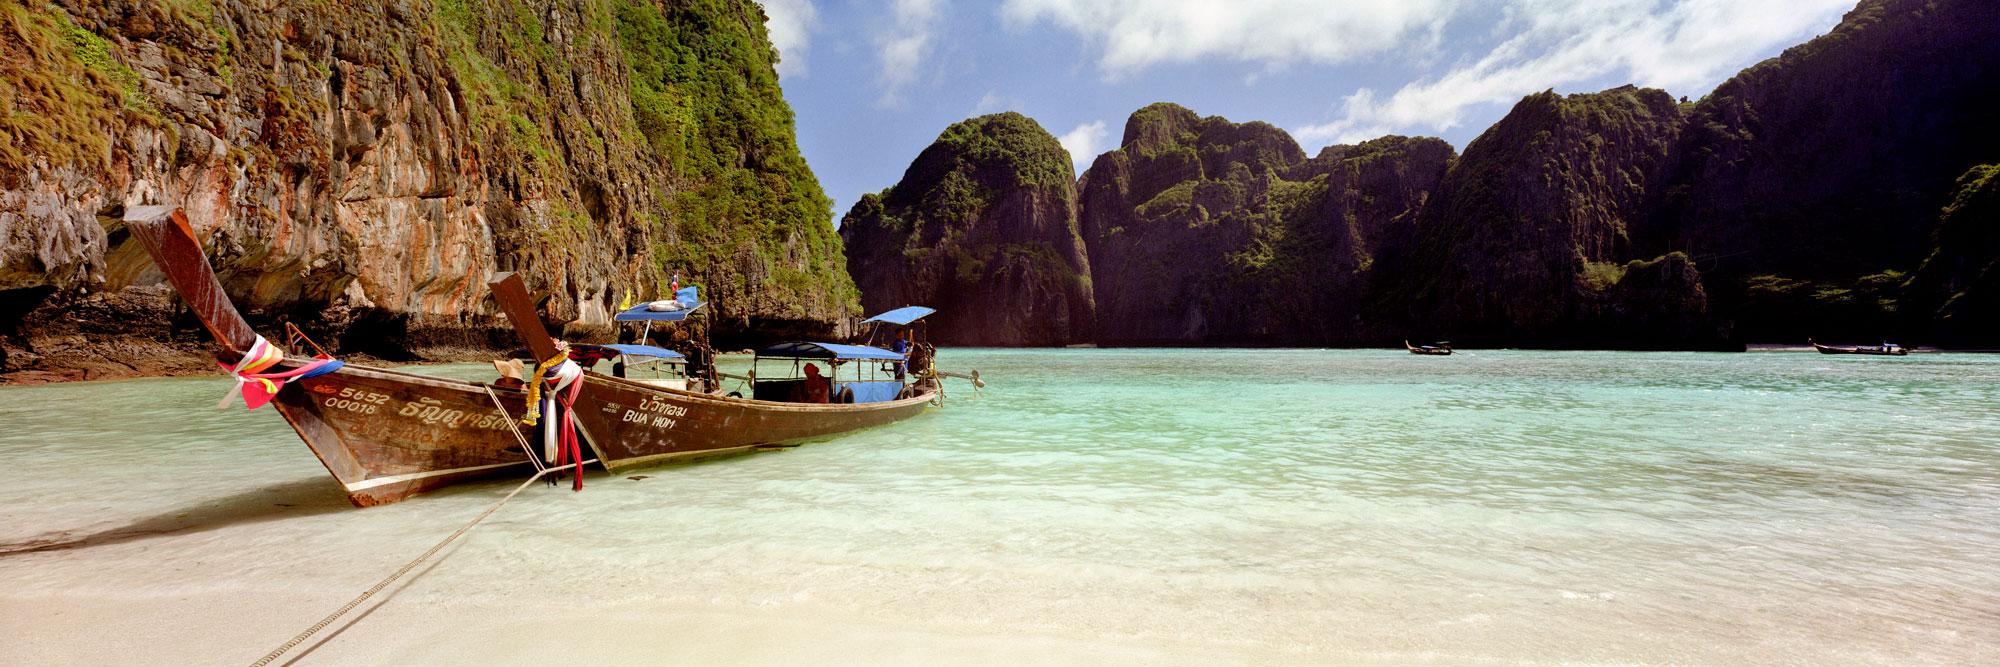 Phi Phi islands beach